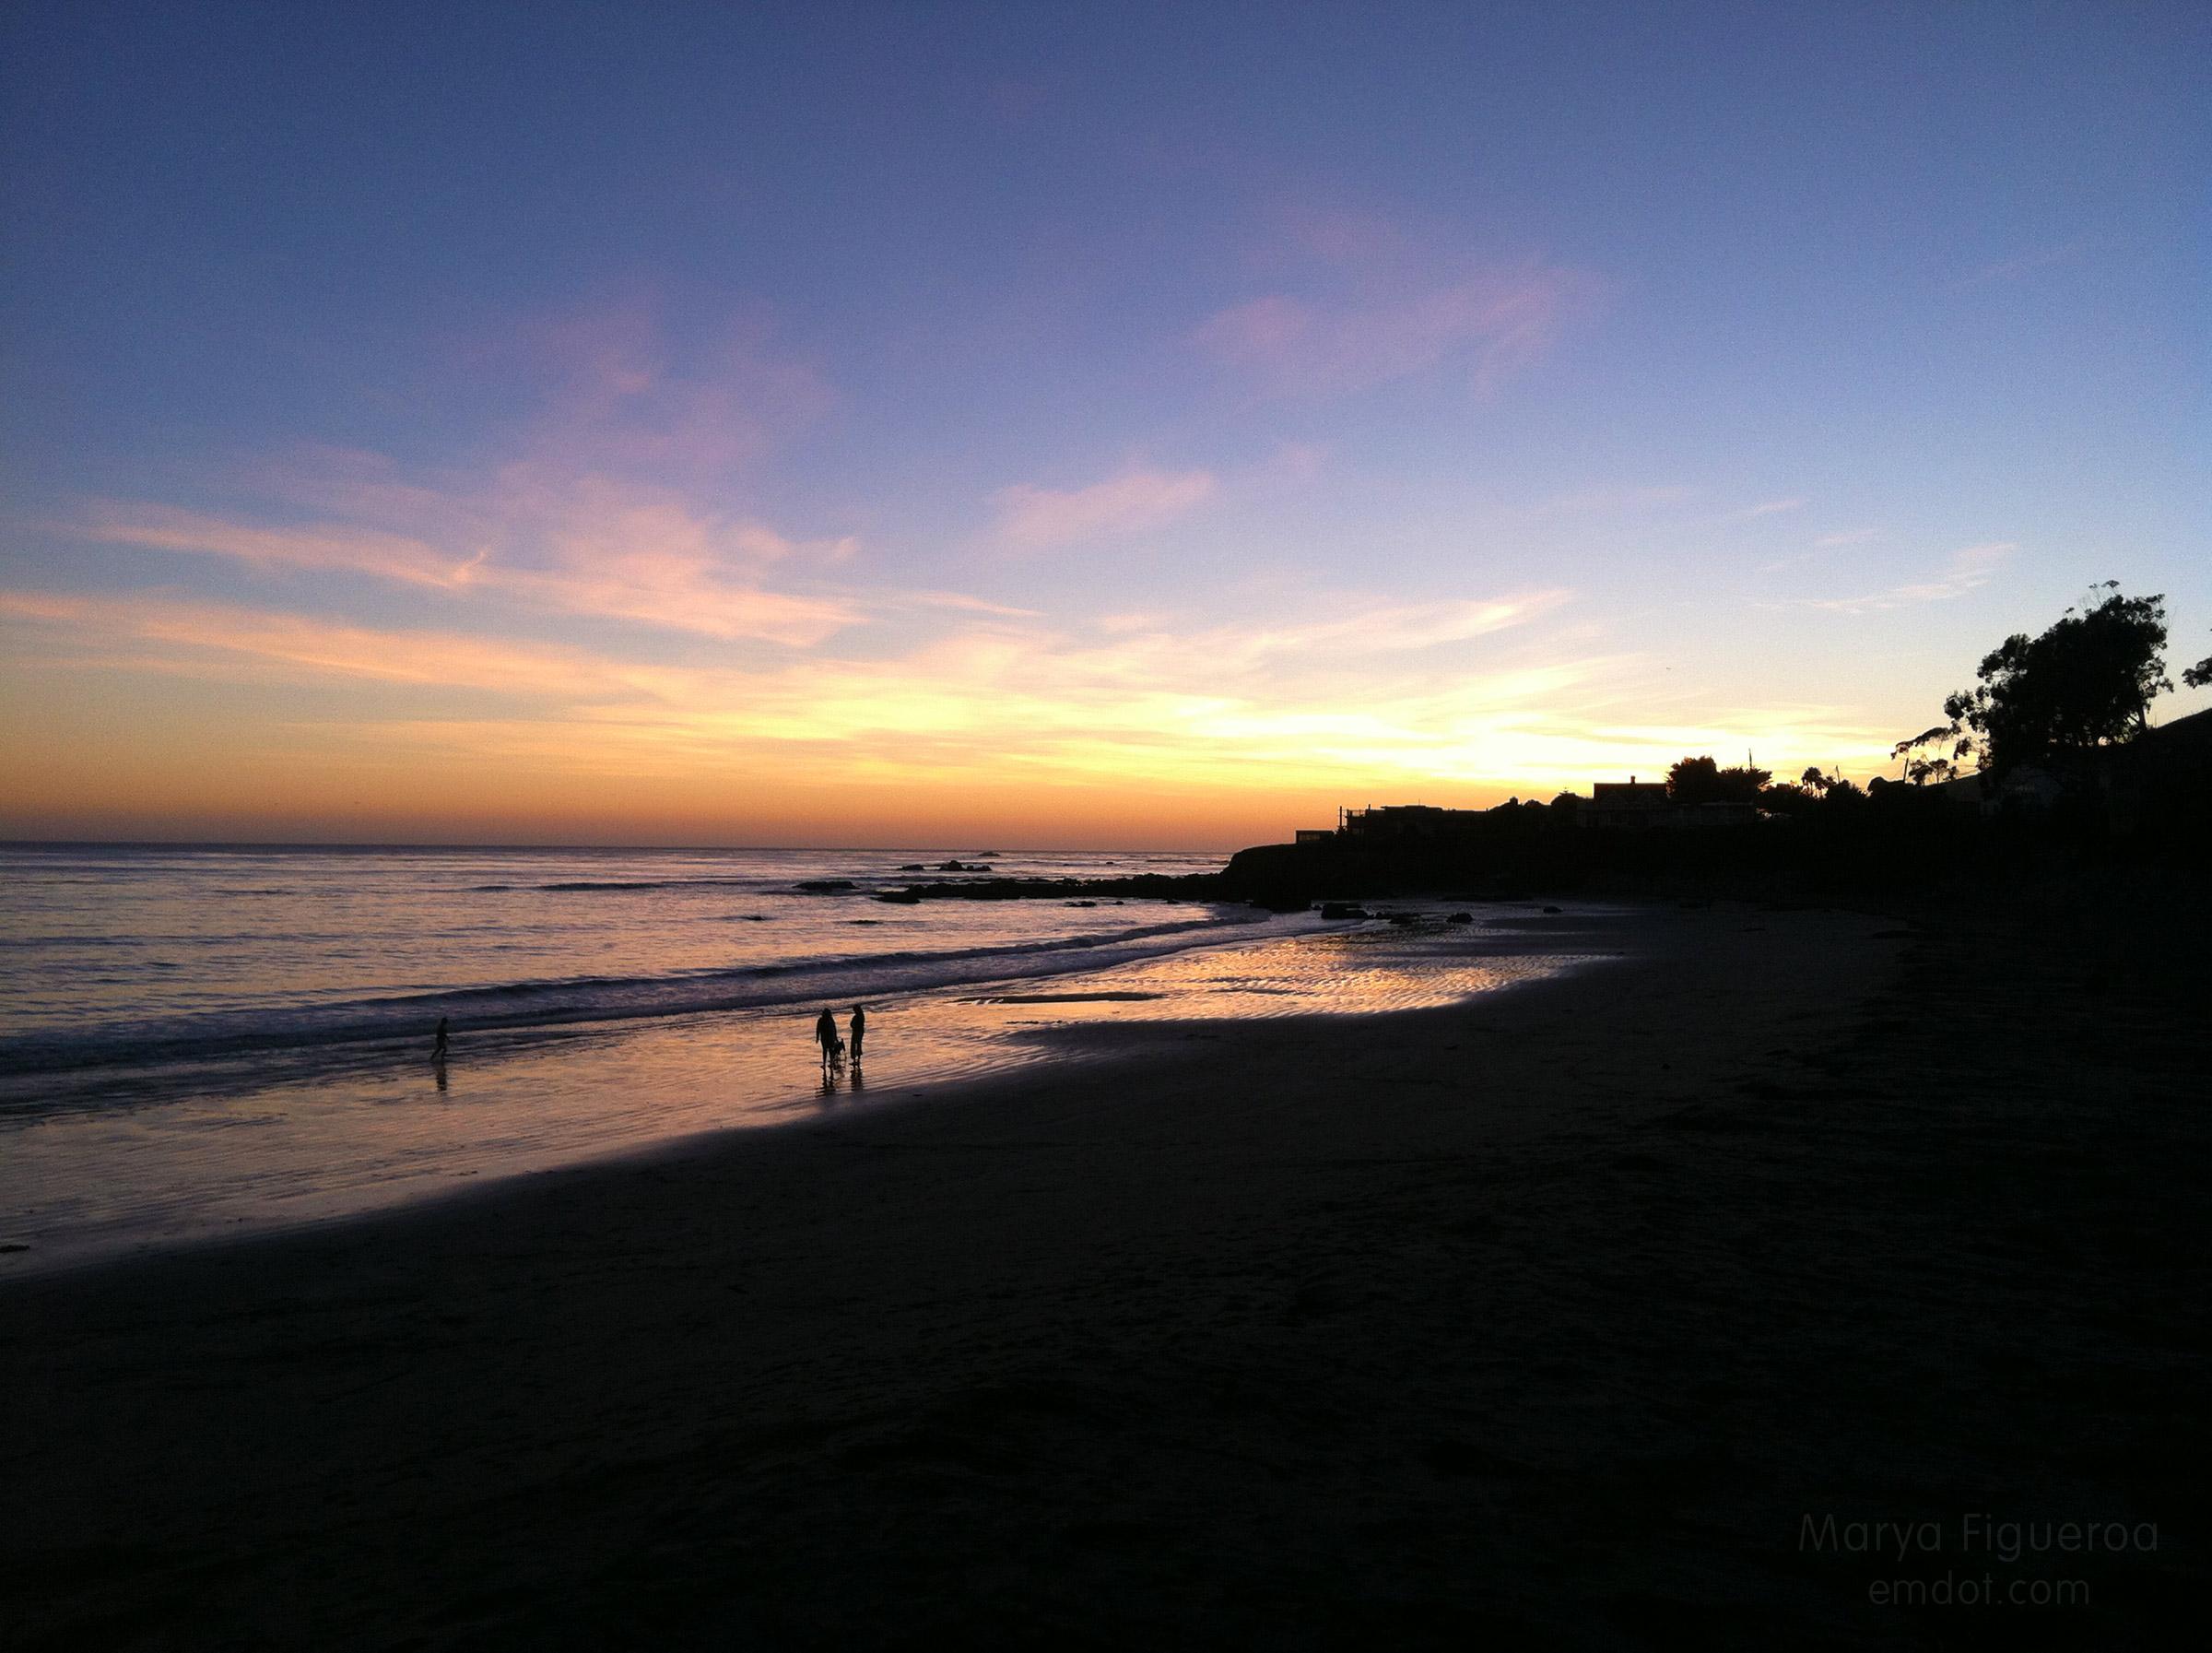 family on the beach, sunset style